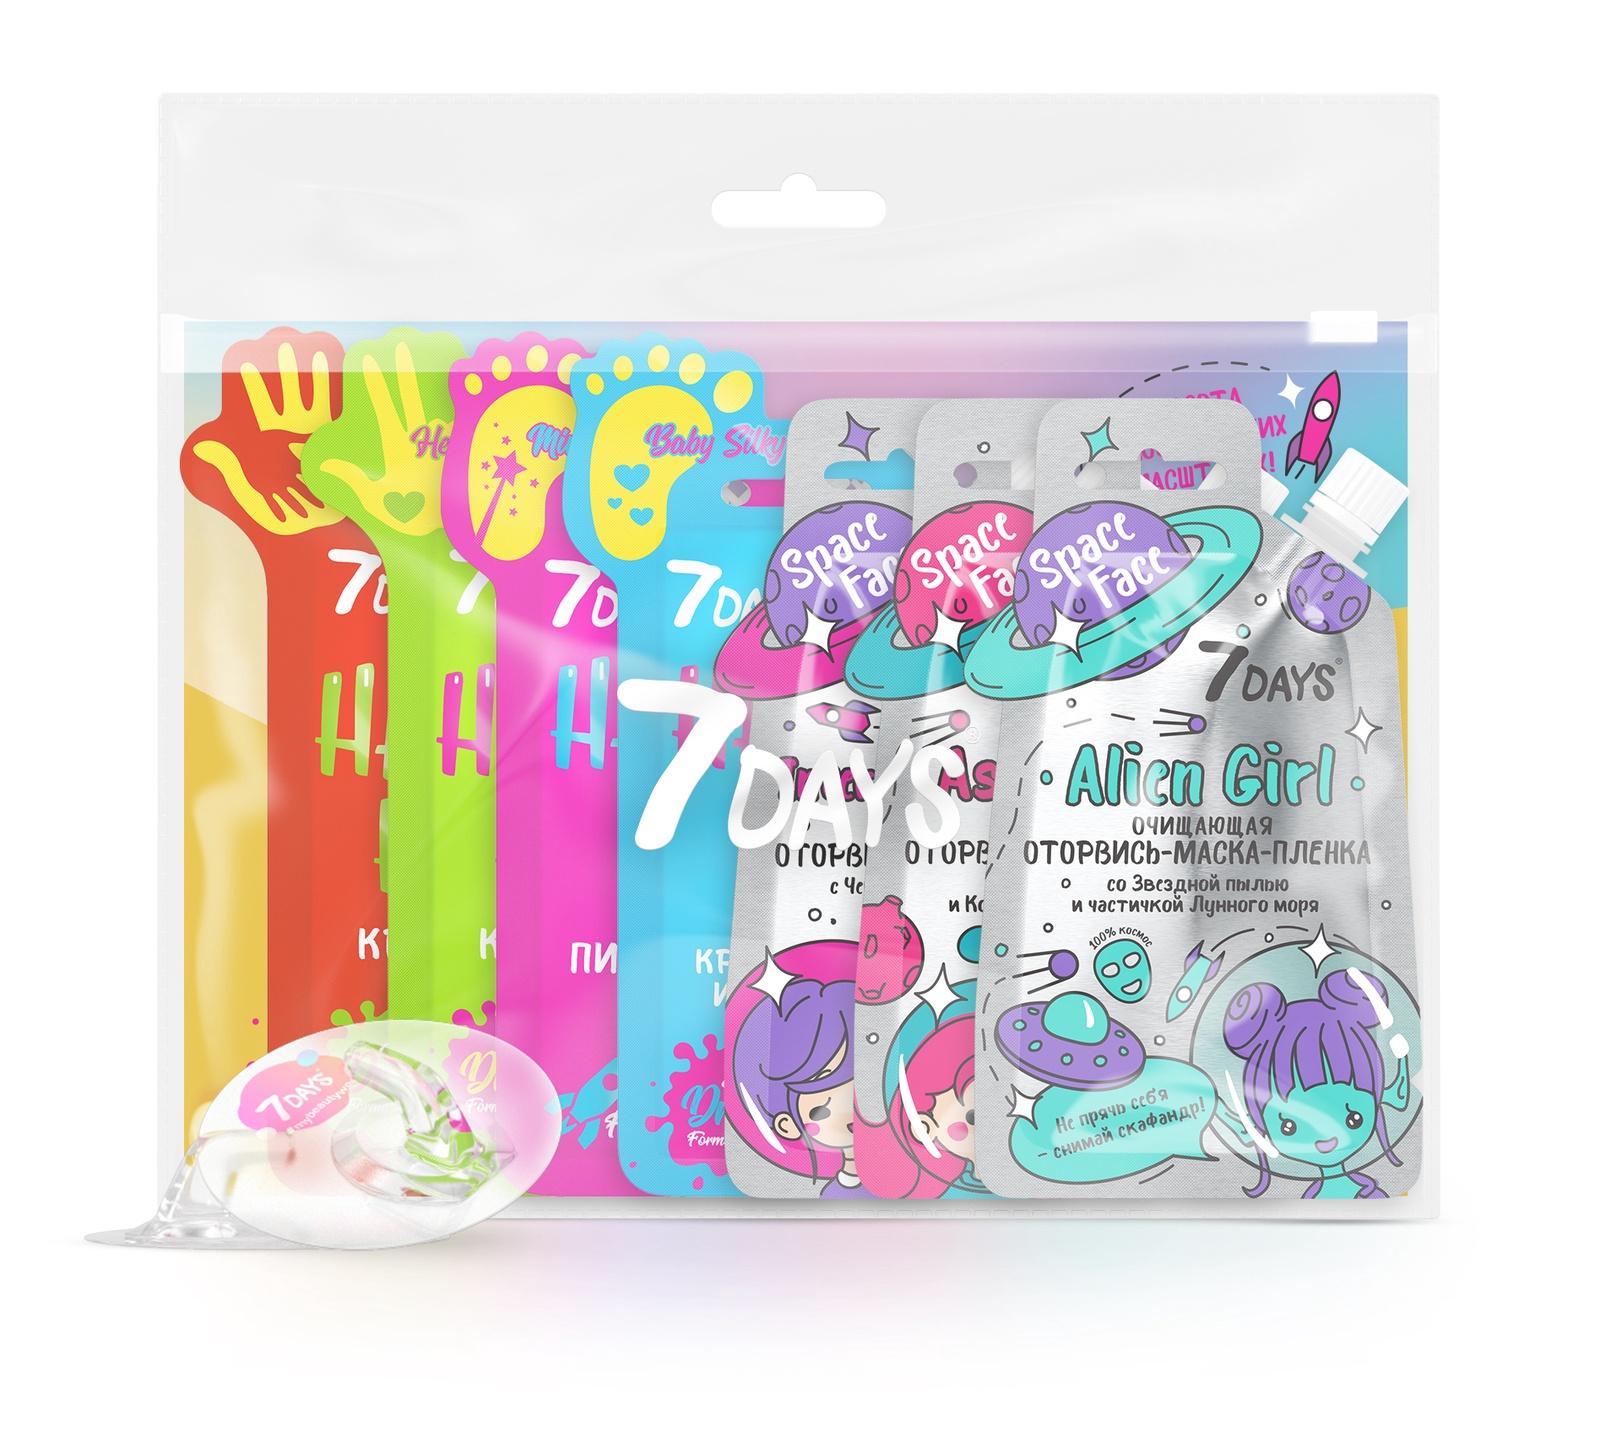 Набор косметики для ухода за кожей 7 Days Beauty Bag Happy Space